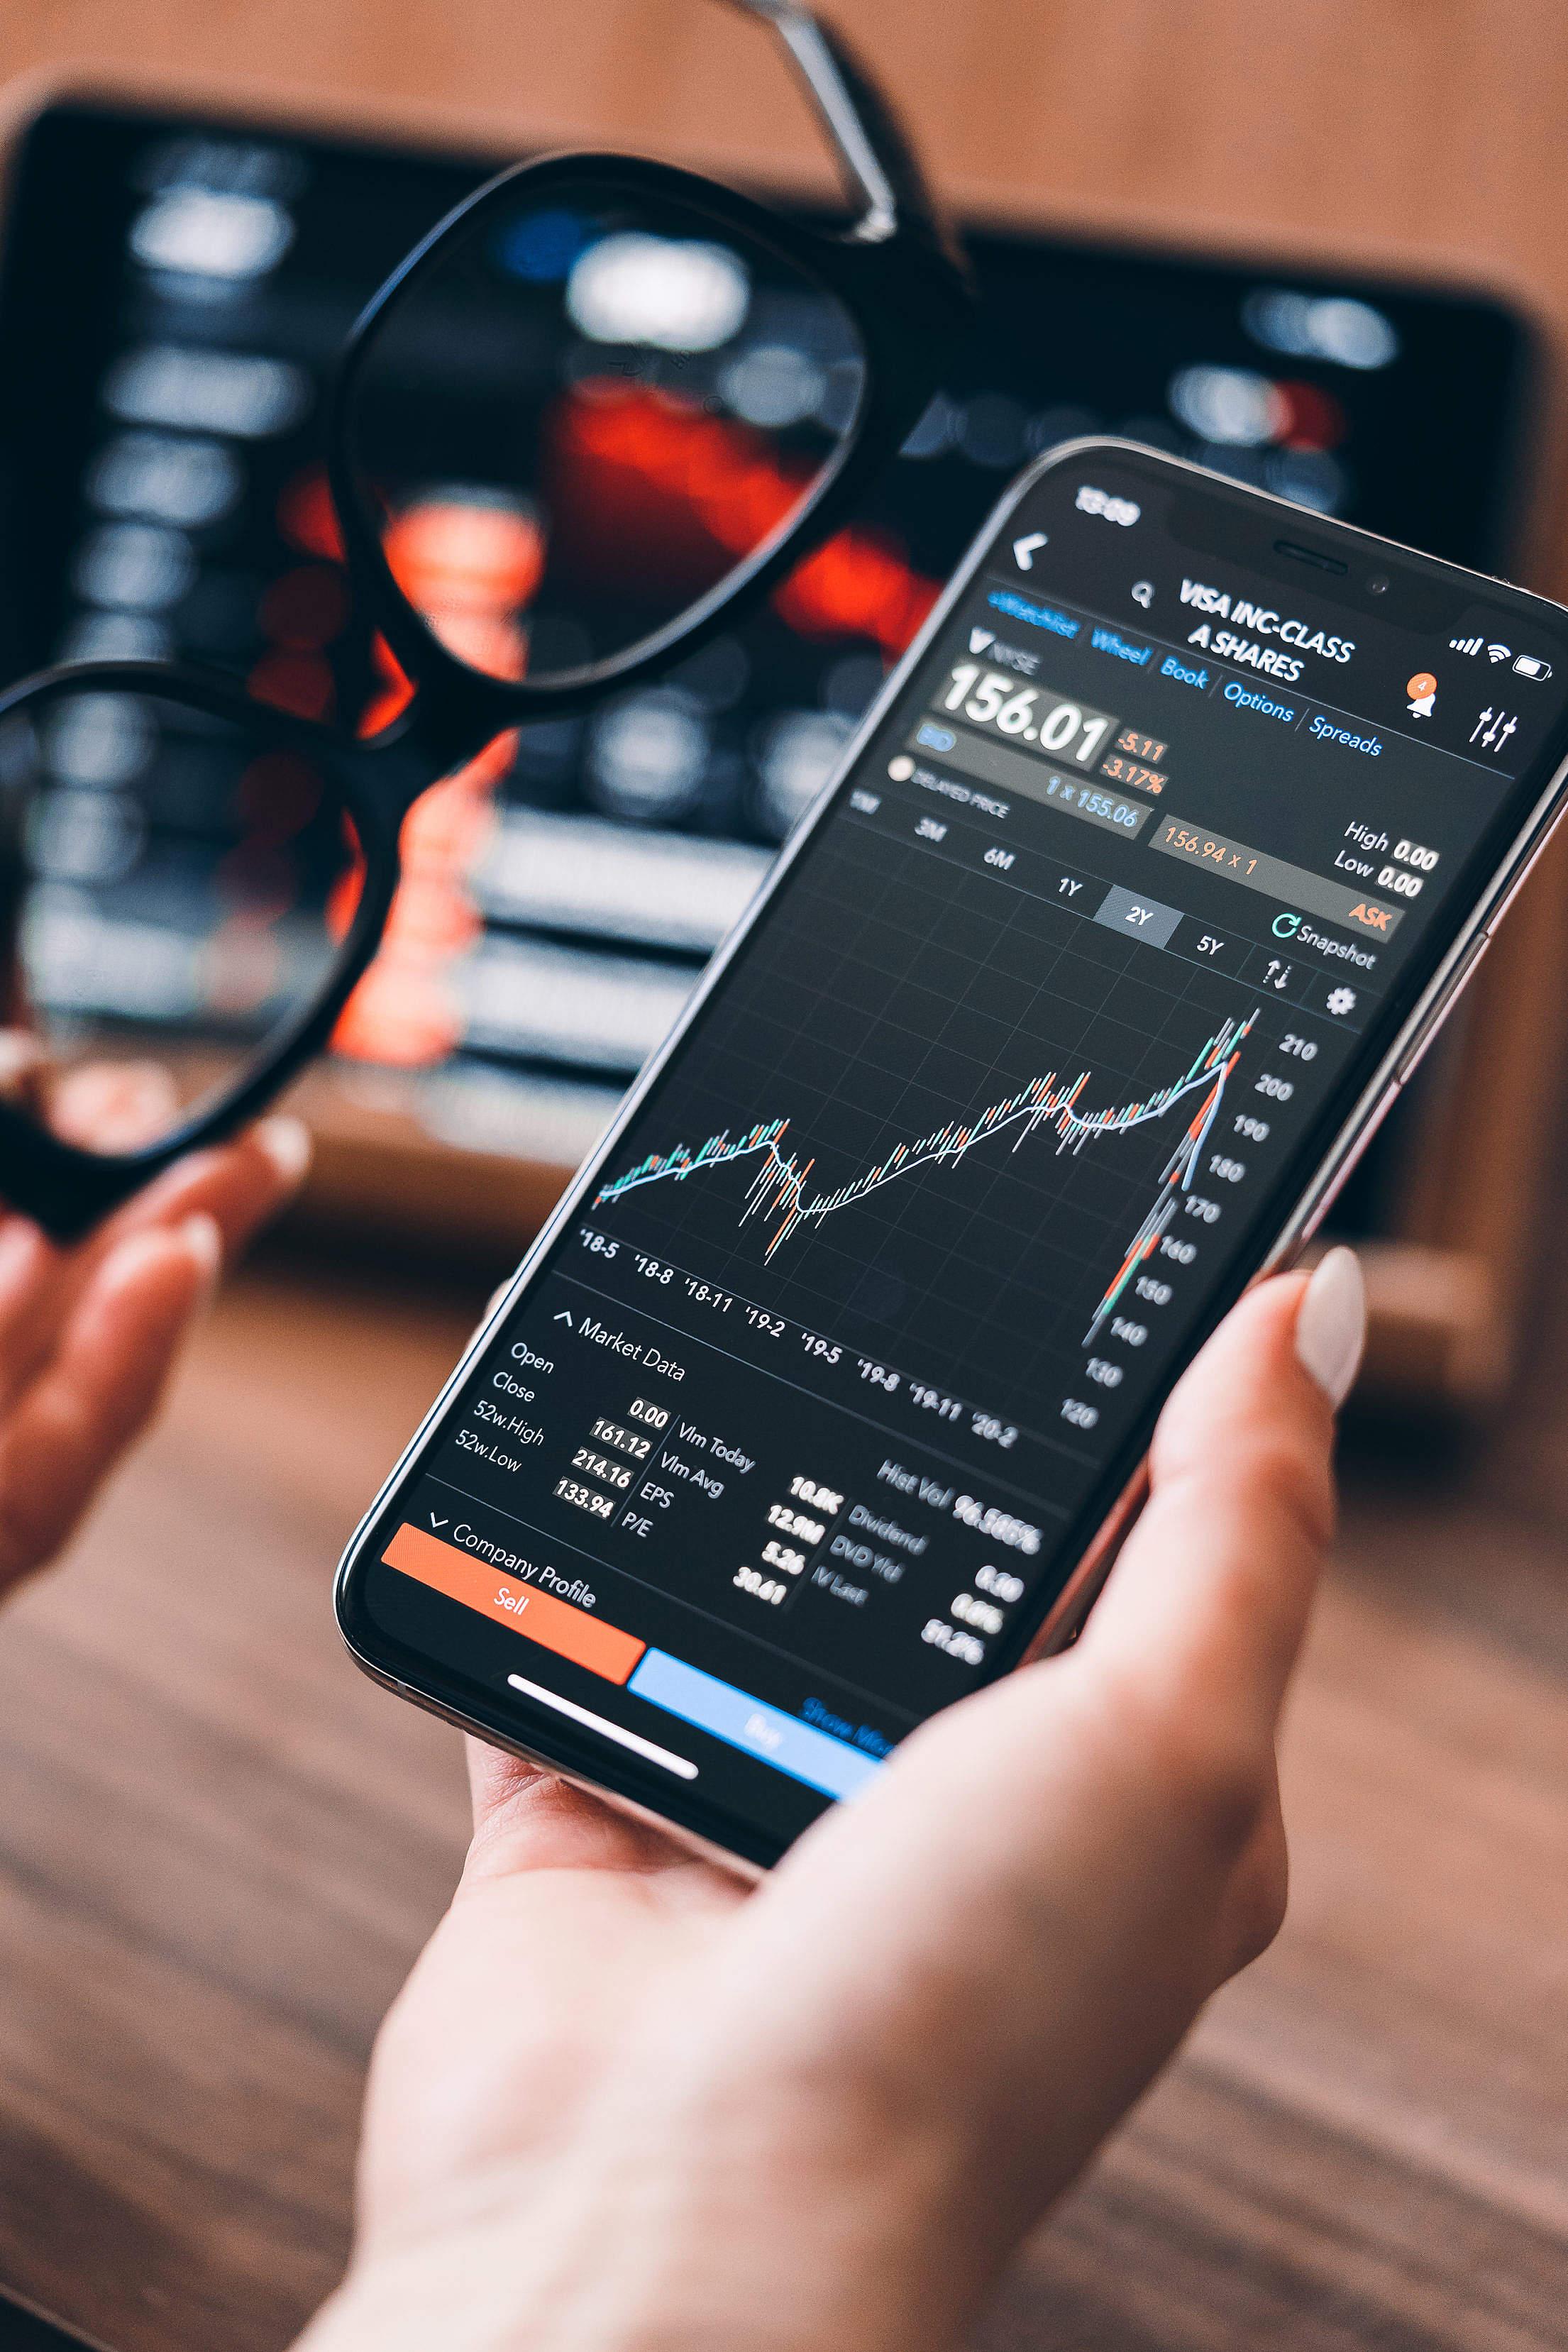 Blue Chip Stocks VISA Inc. Market Data Free Stock Photo